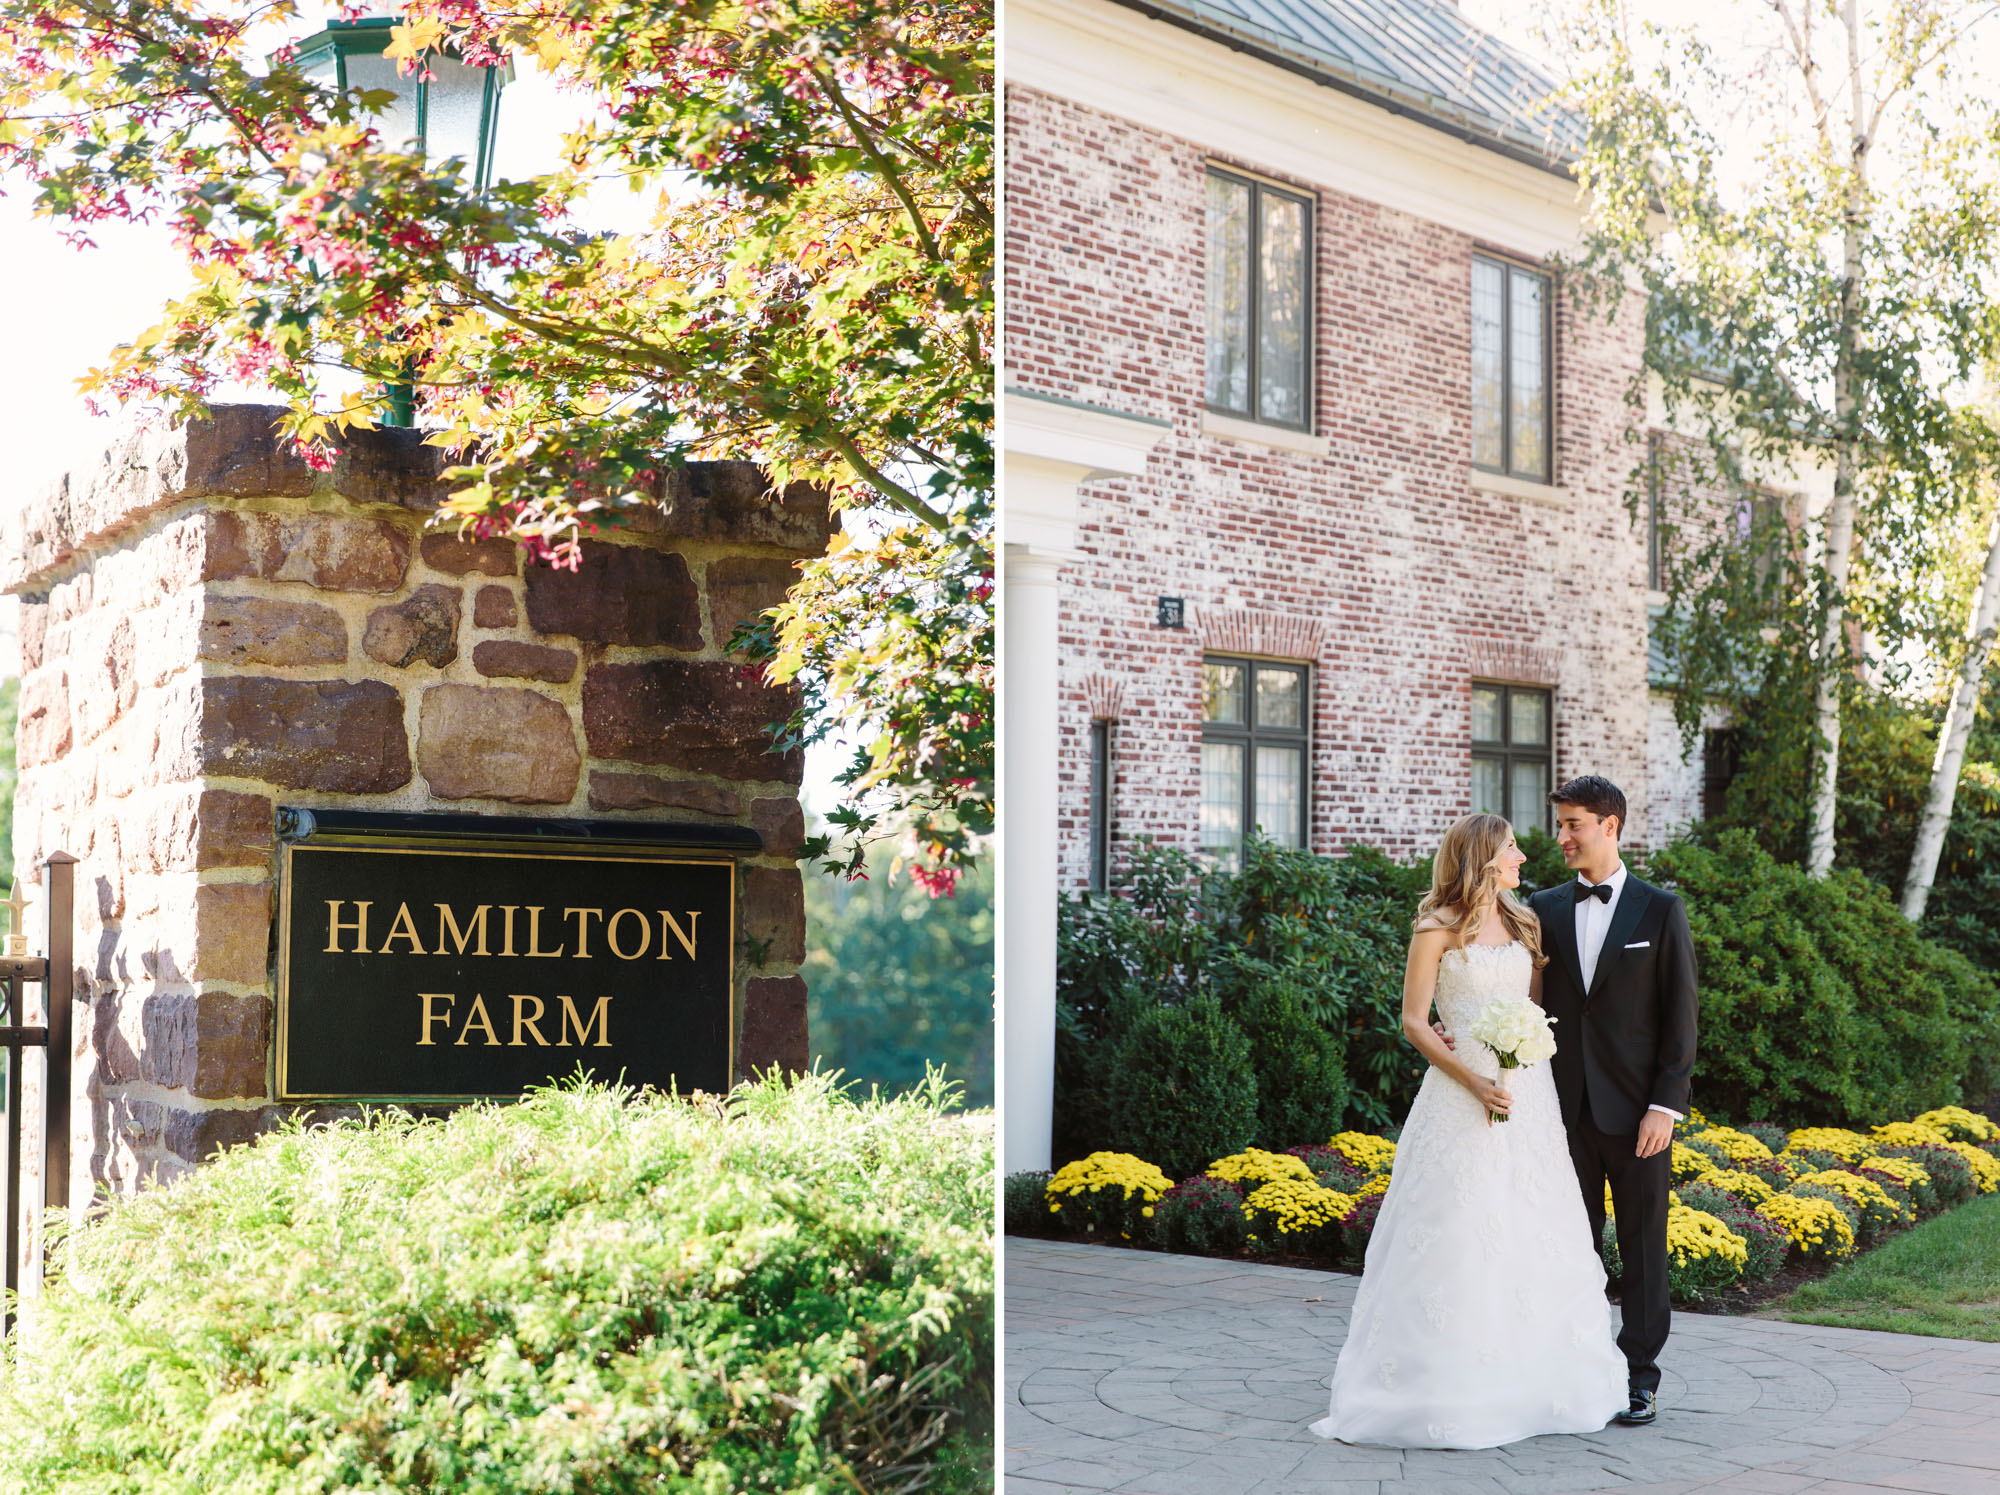 01_Christina_Daniel_Hamilton_Farm_Golf_Club_Wedding_NJ_Tanya_Salazar_Photography_.jpg